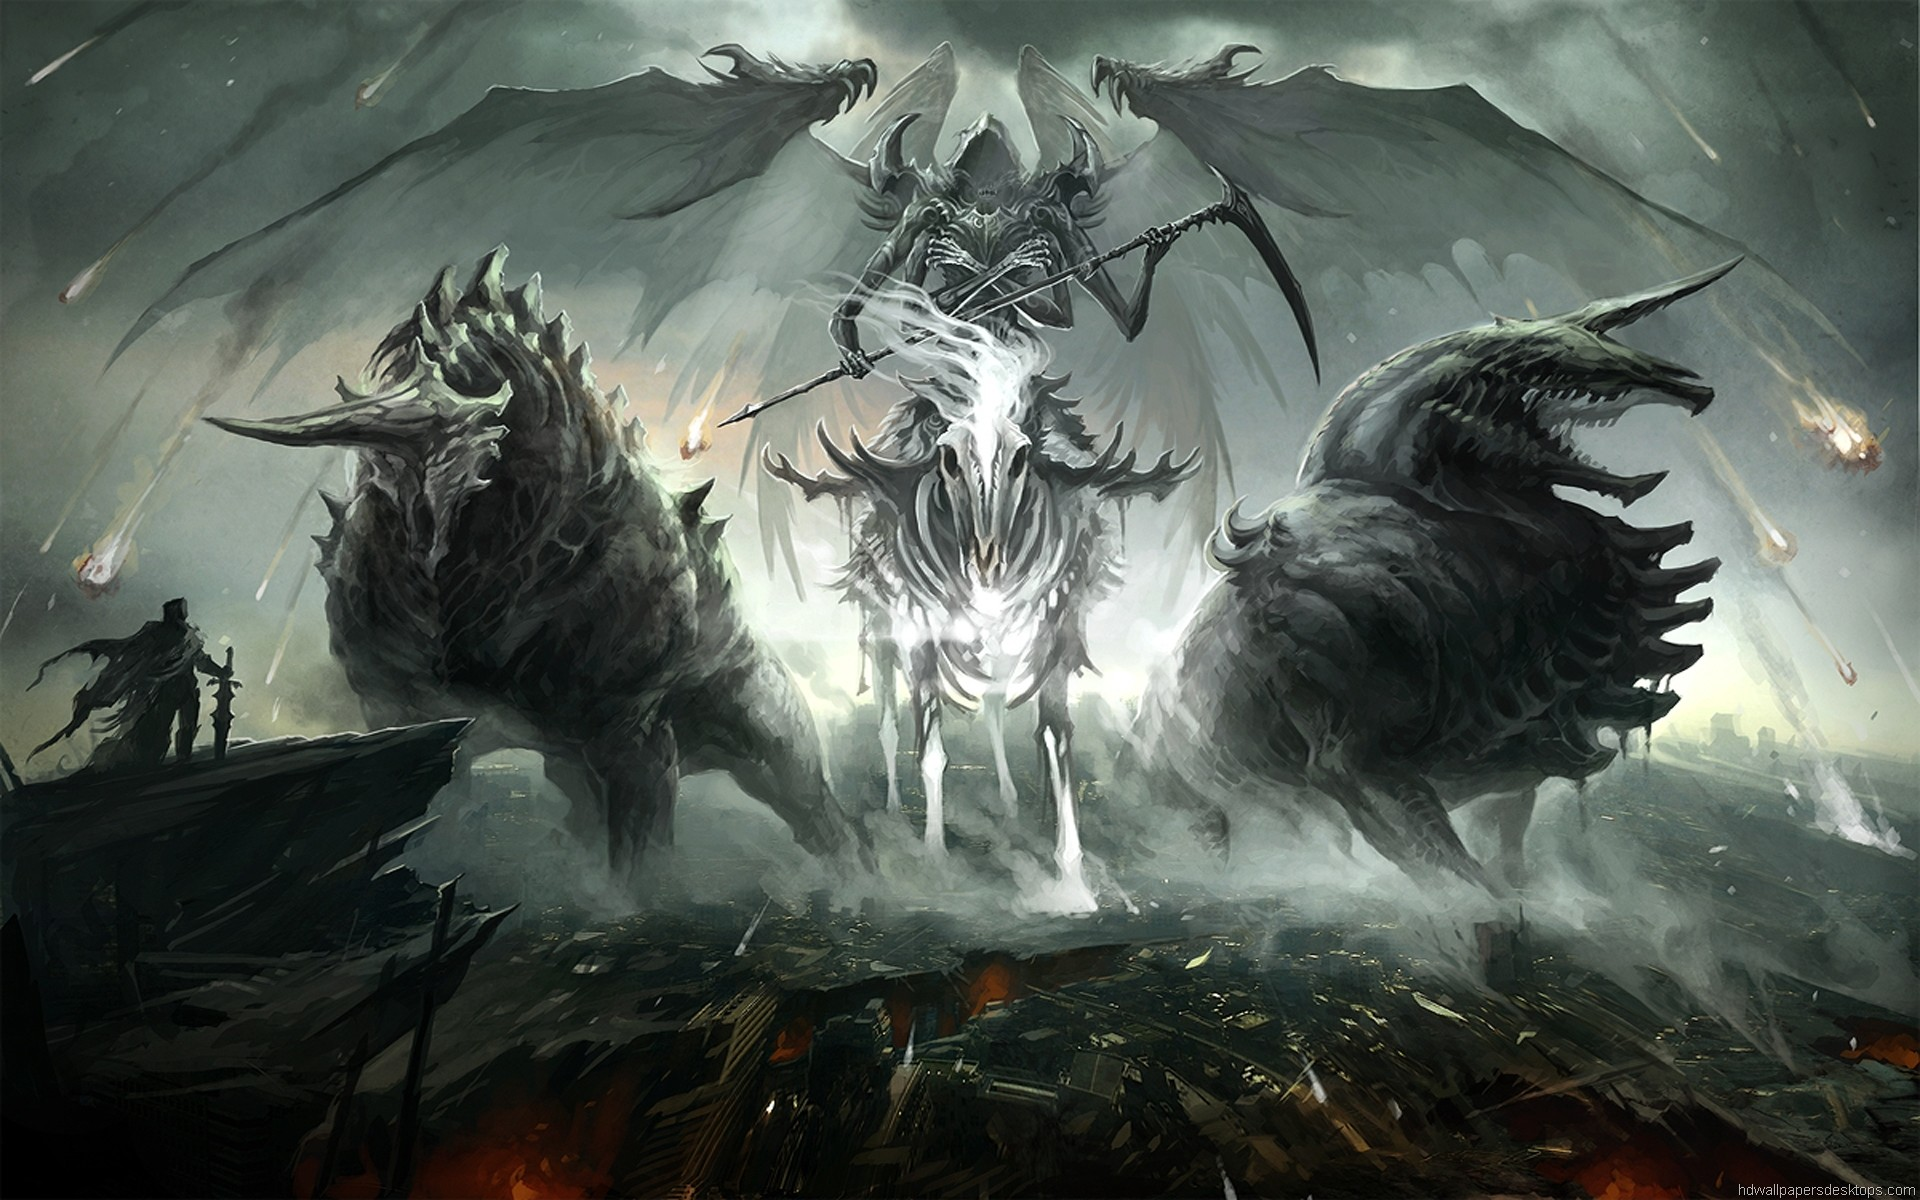 Res: 1920x1200, Dragon Game Art Fantasy Wallpaper Wallpaper